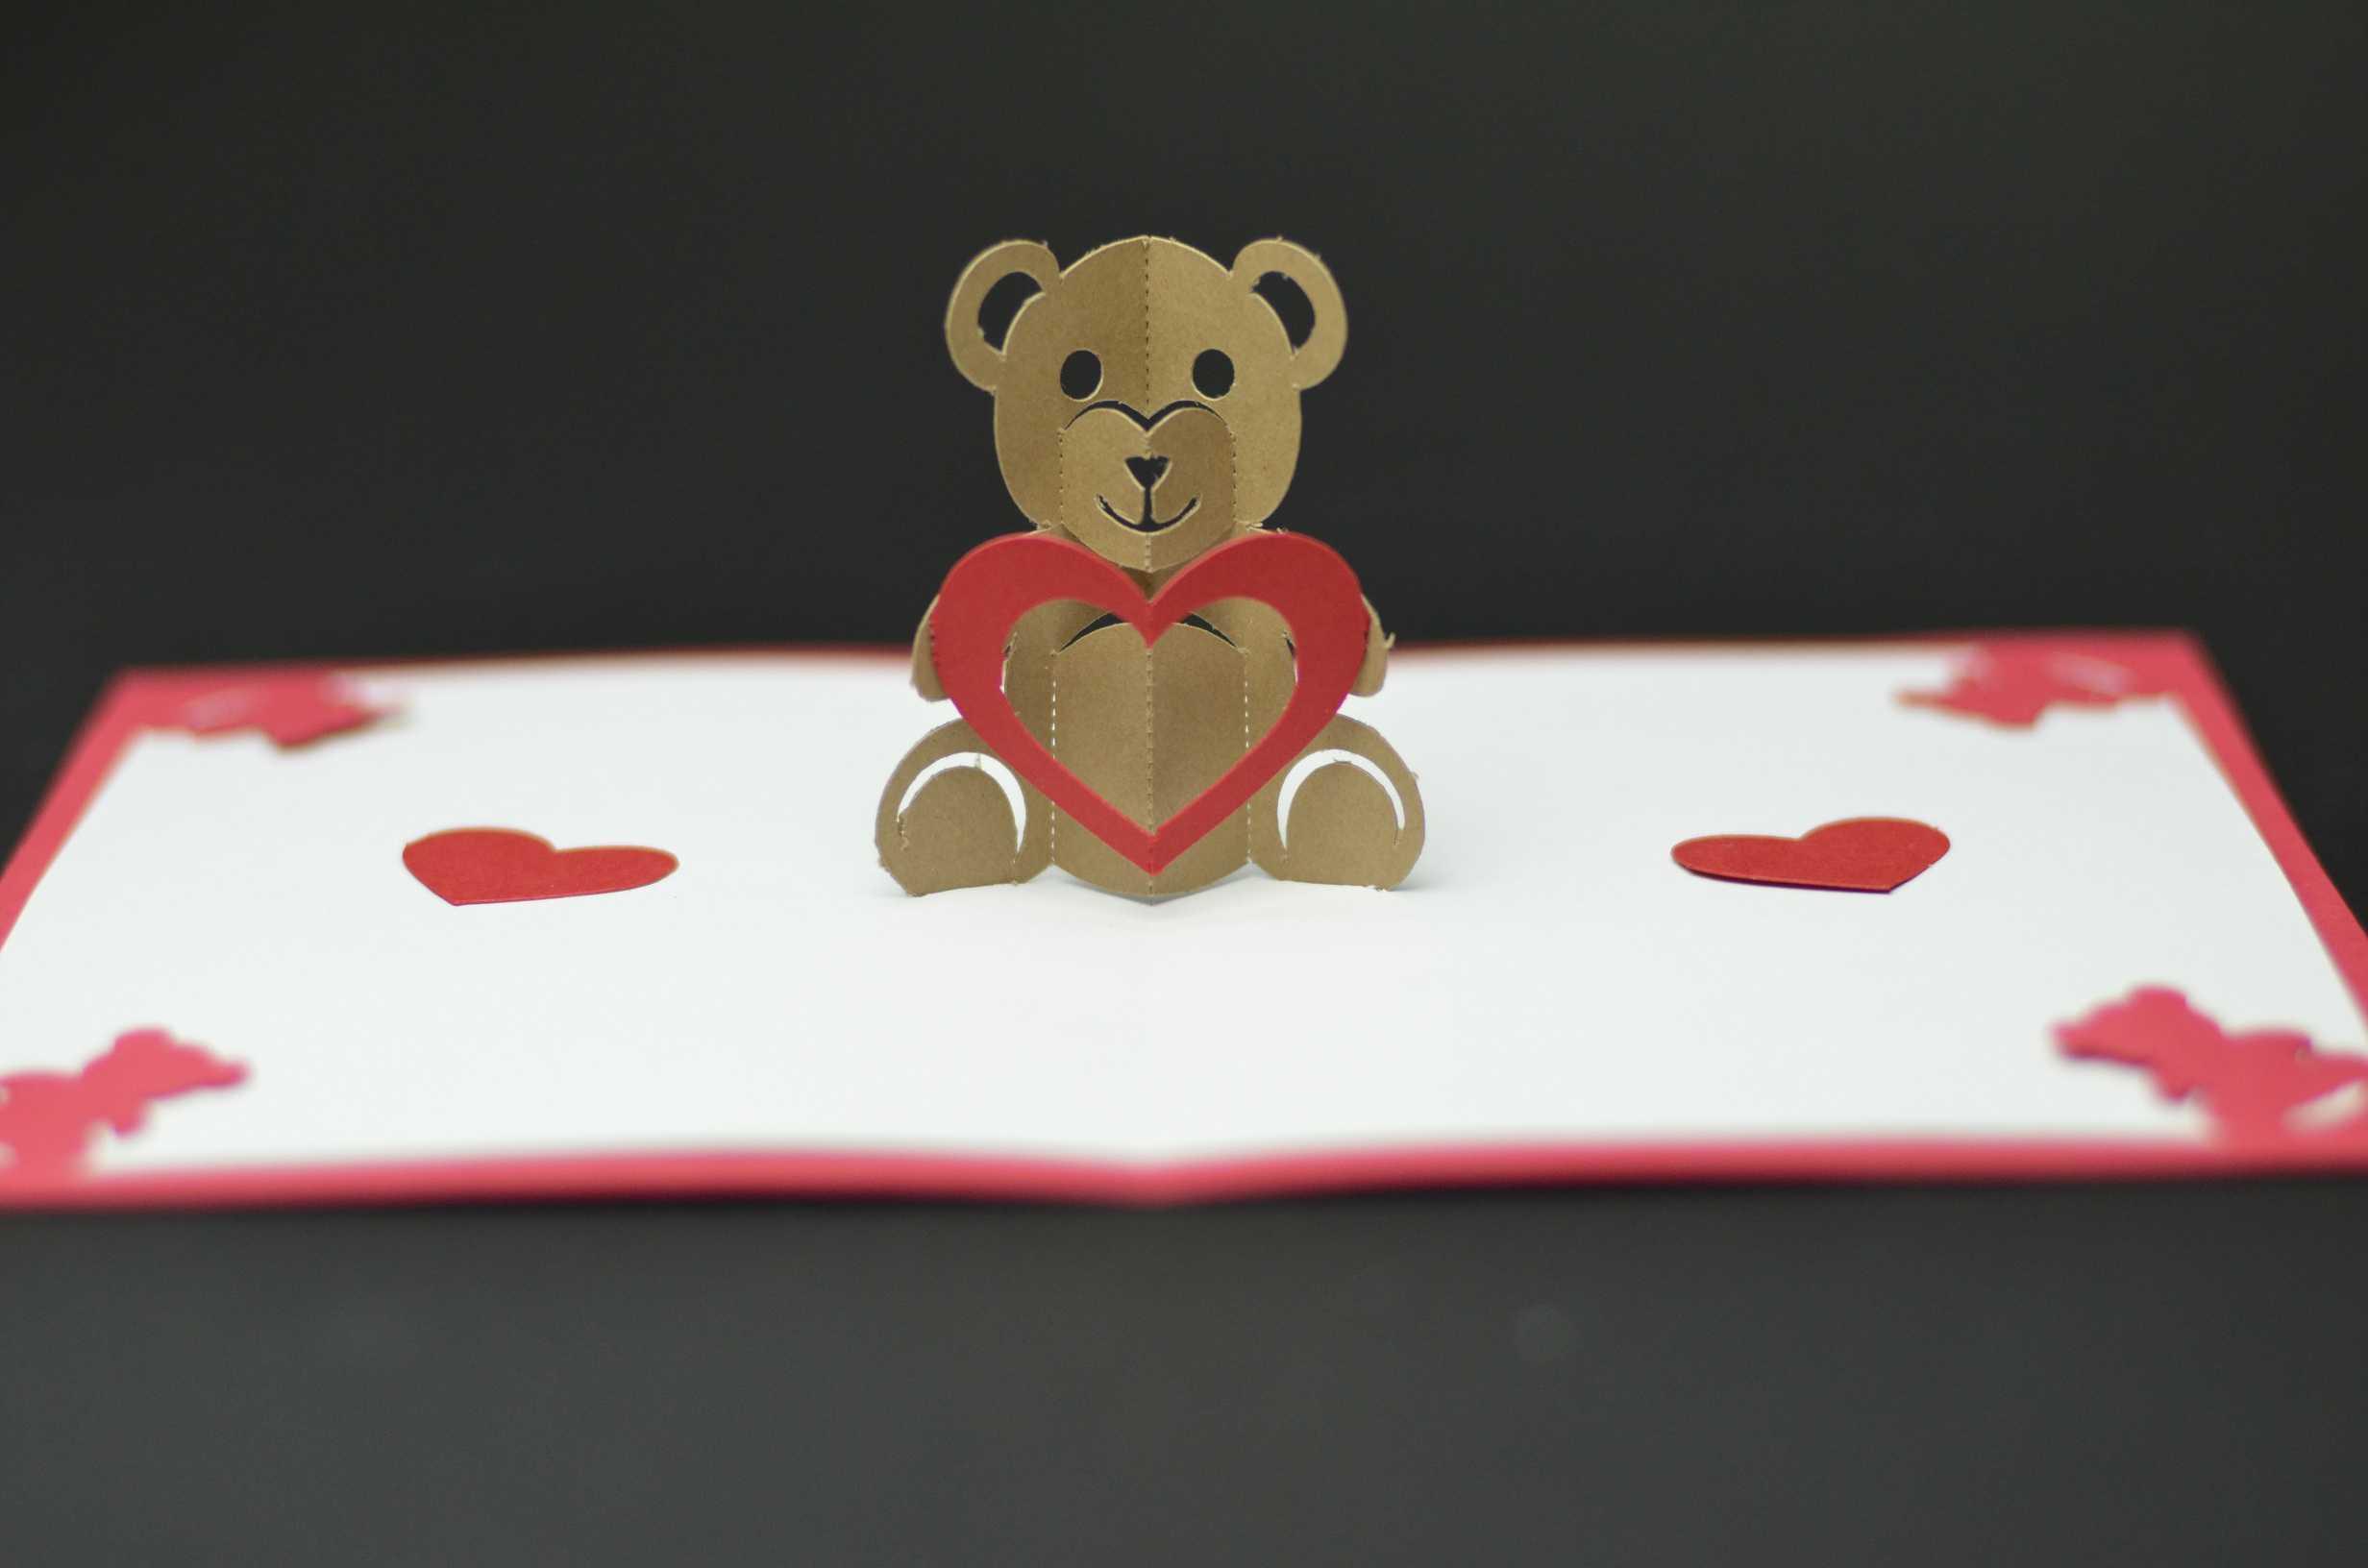 Pop Up Card Tutorials And Templates - Creative Pop Up Cards With Diy Pop Up Cards Templates